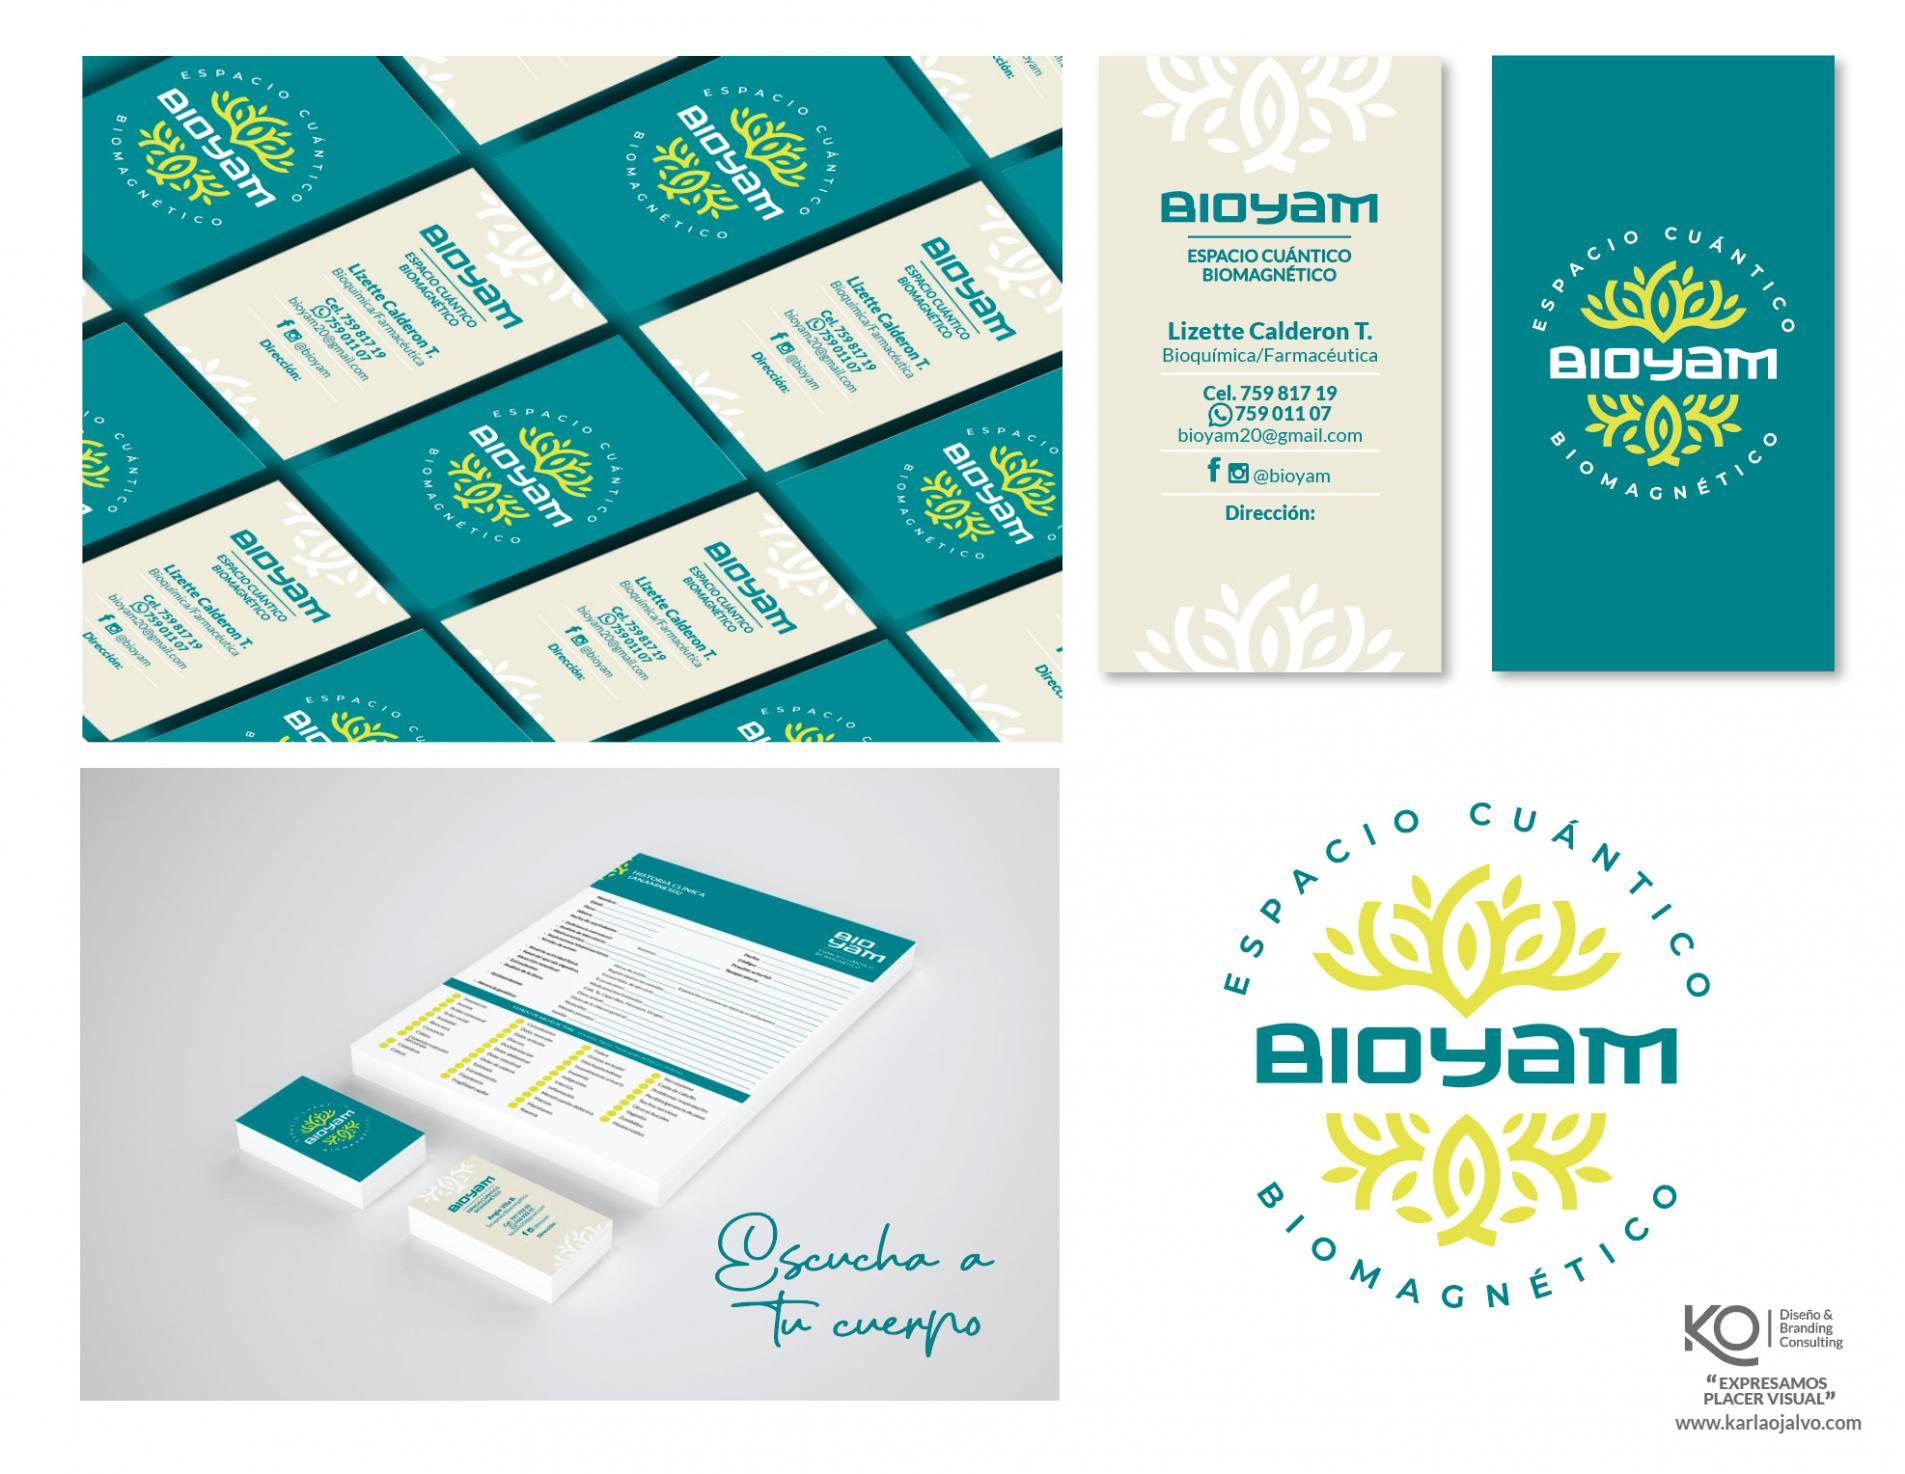 branding y marca